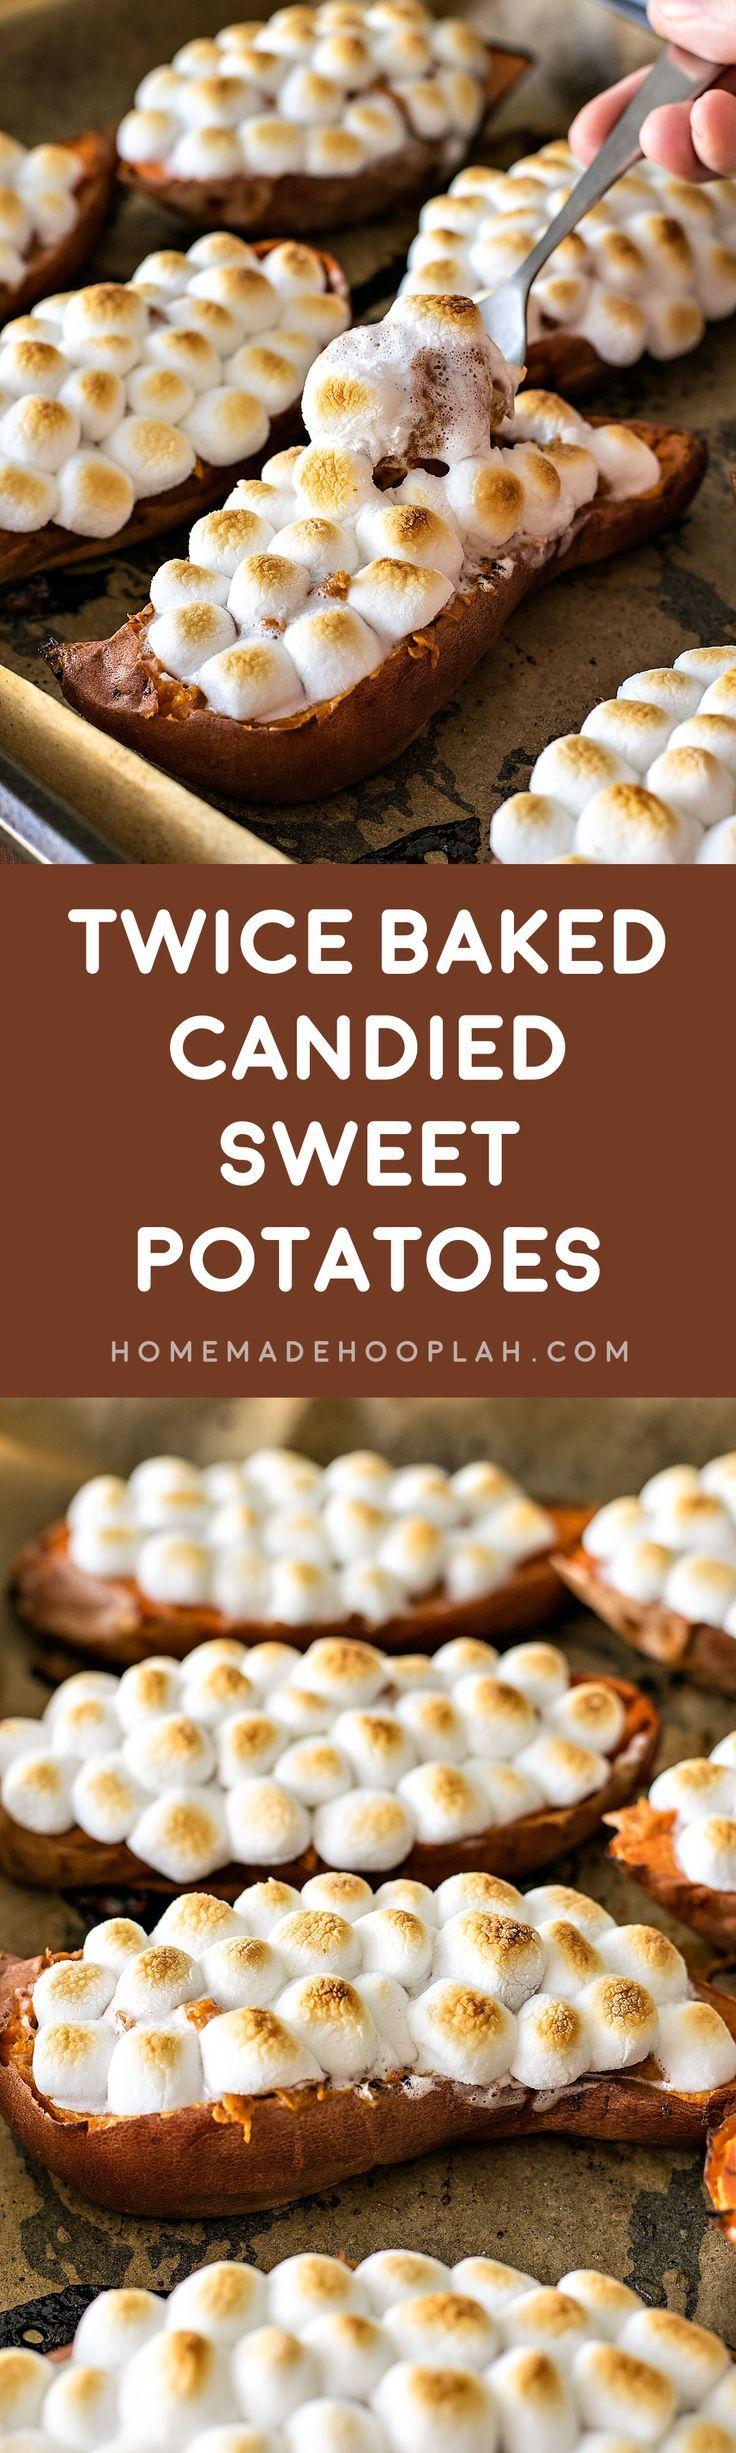 ... sweet potatoes sweetened with brown sugar, cinnamon, and nutmeg, then